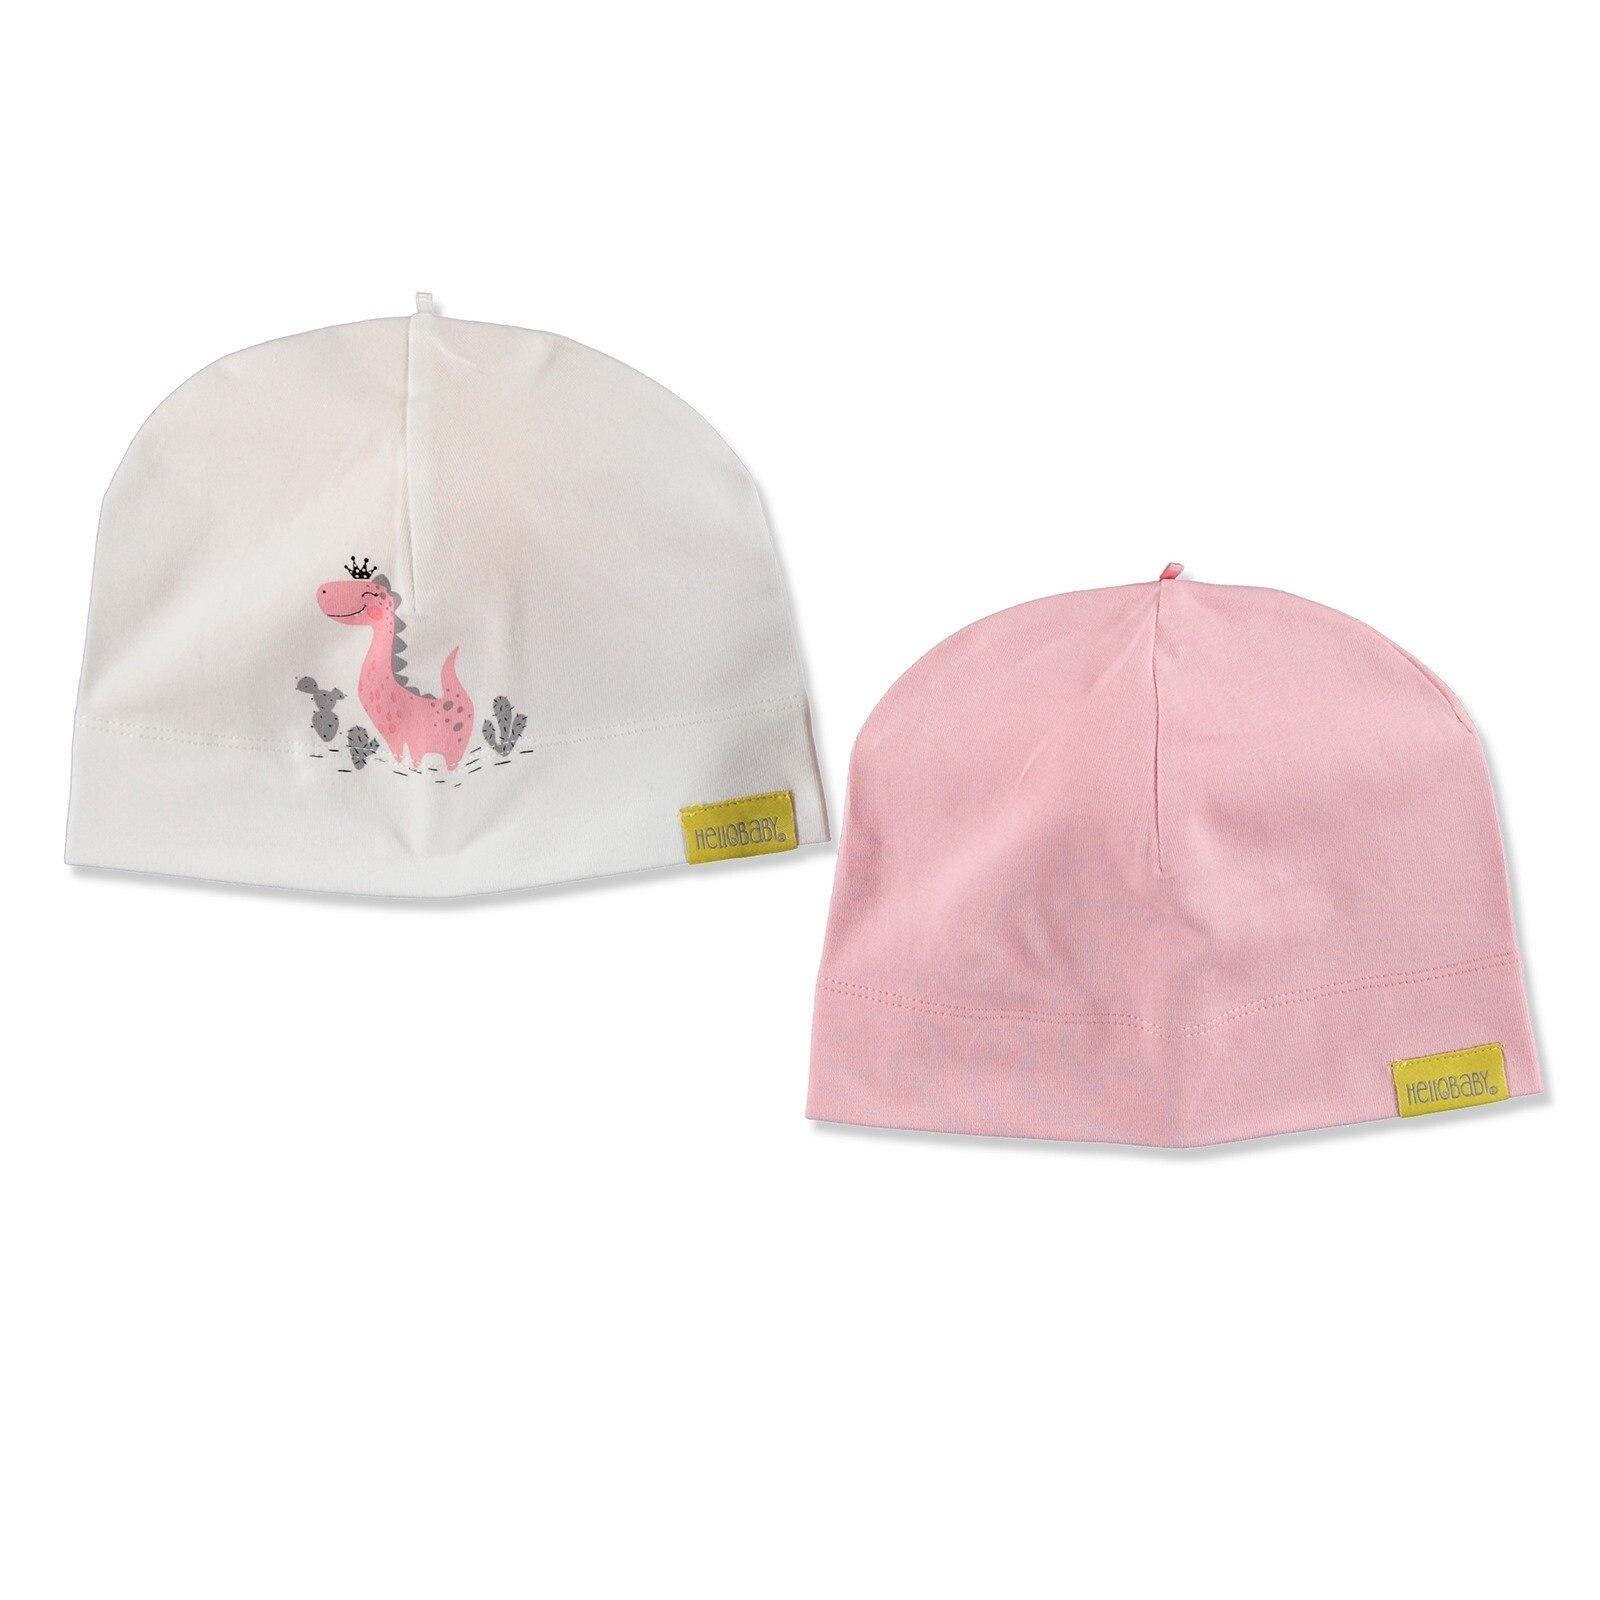 Ebebek HelloBaby Summer Baby Girl Hat 2 Pcs